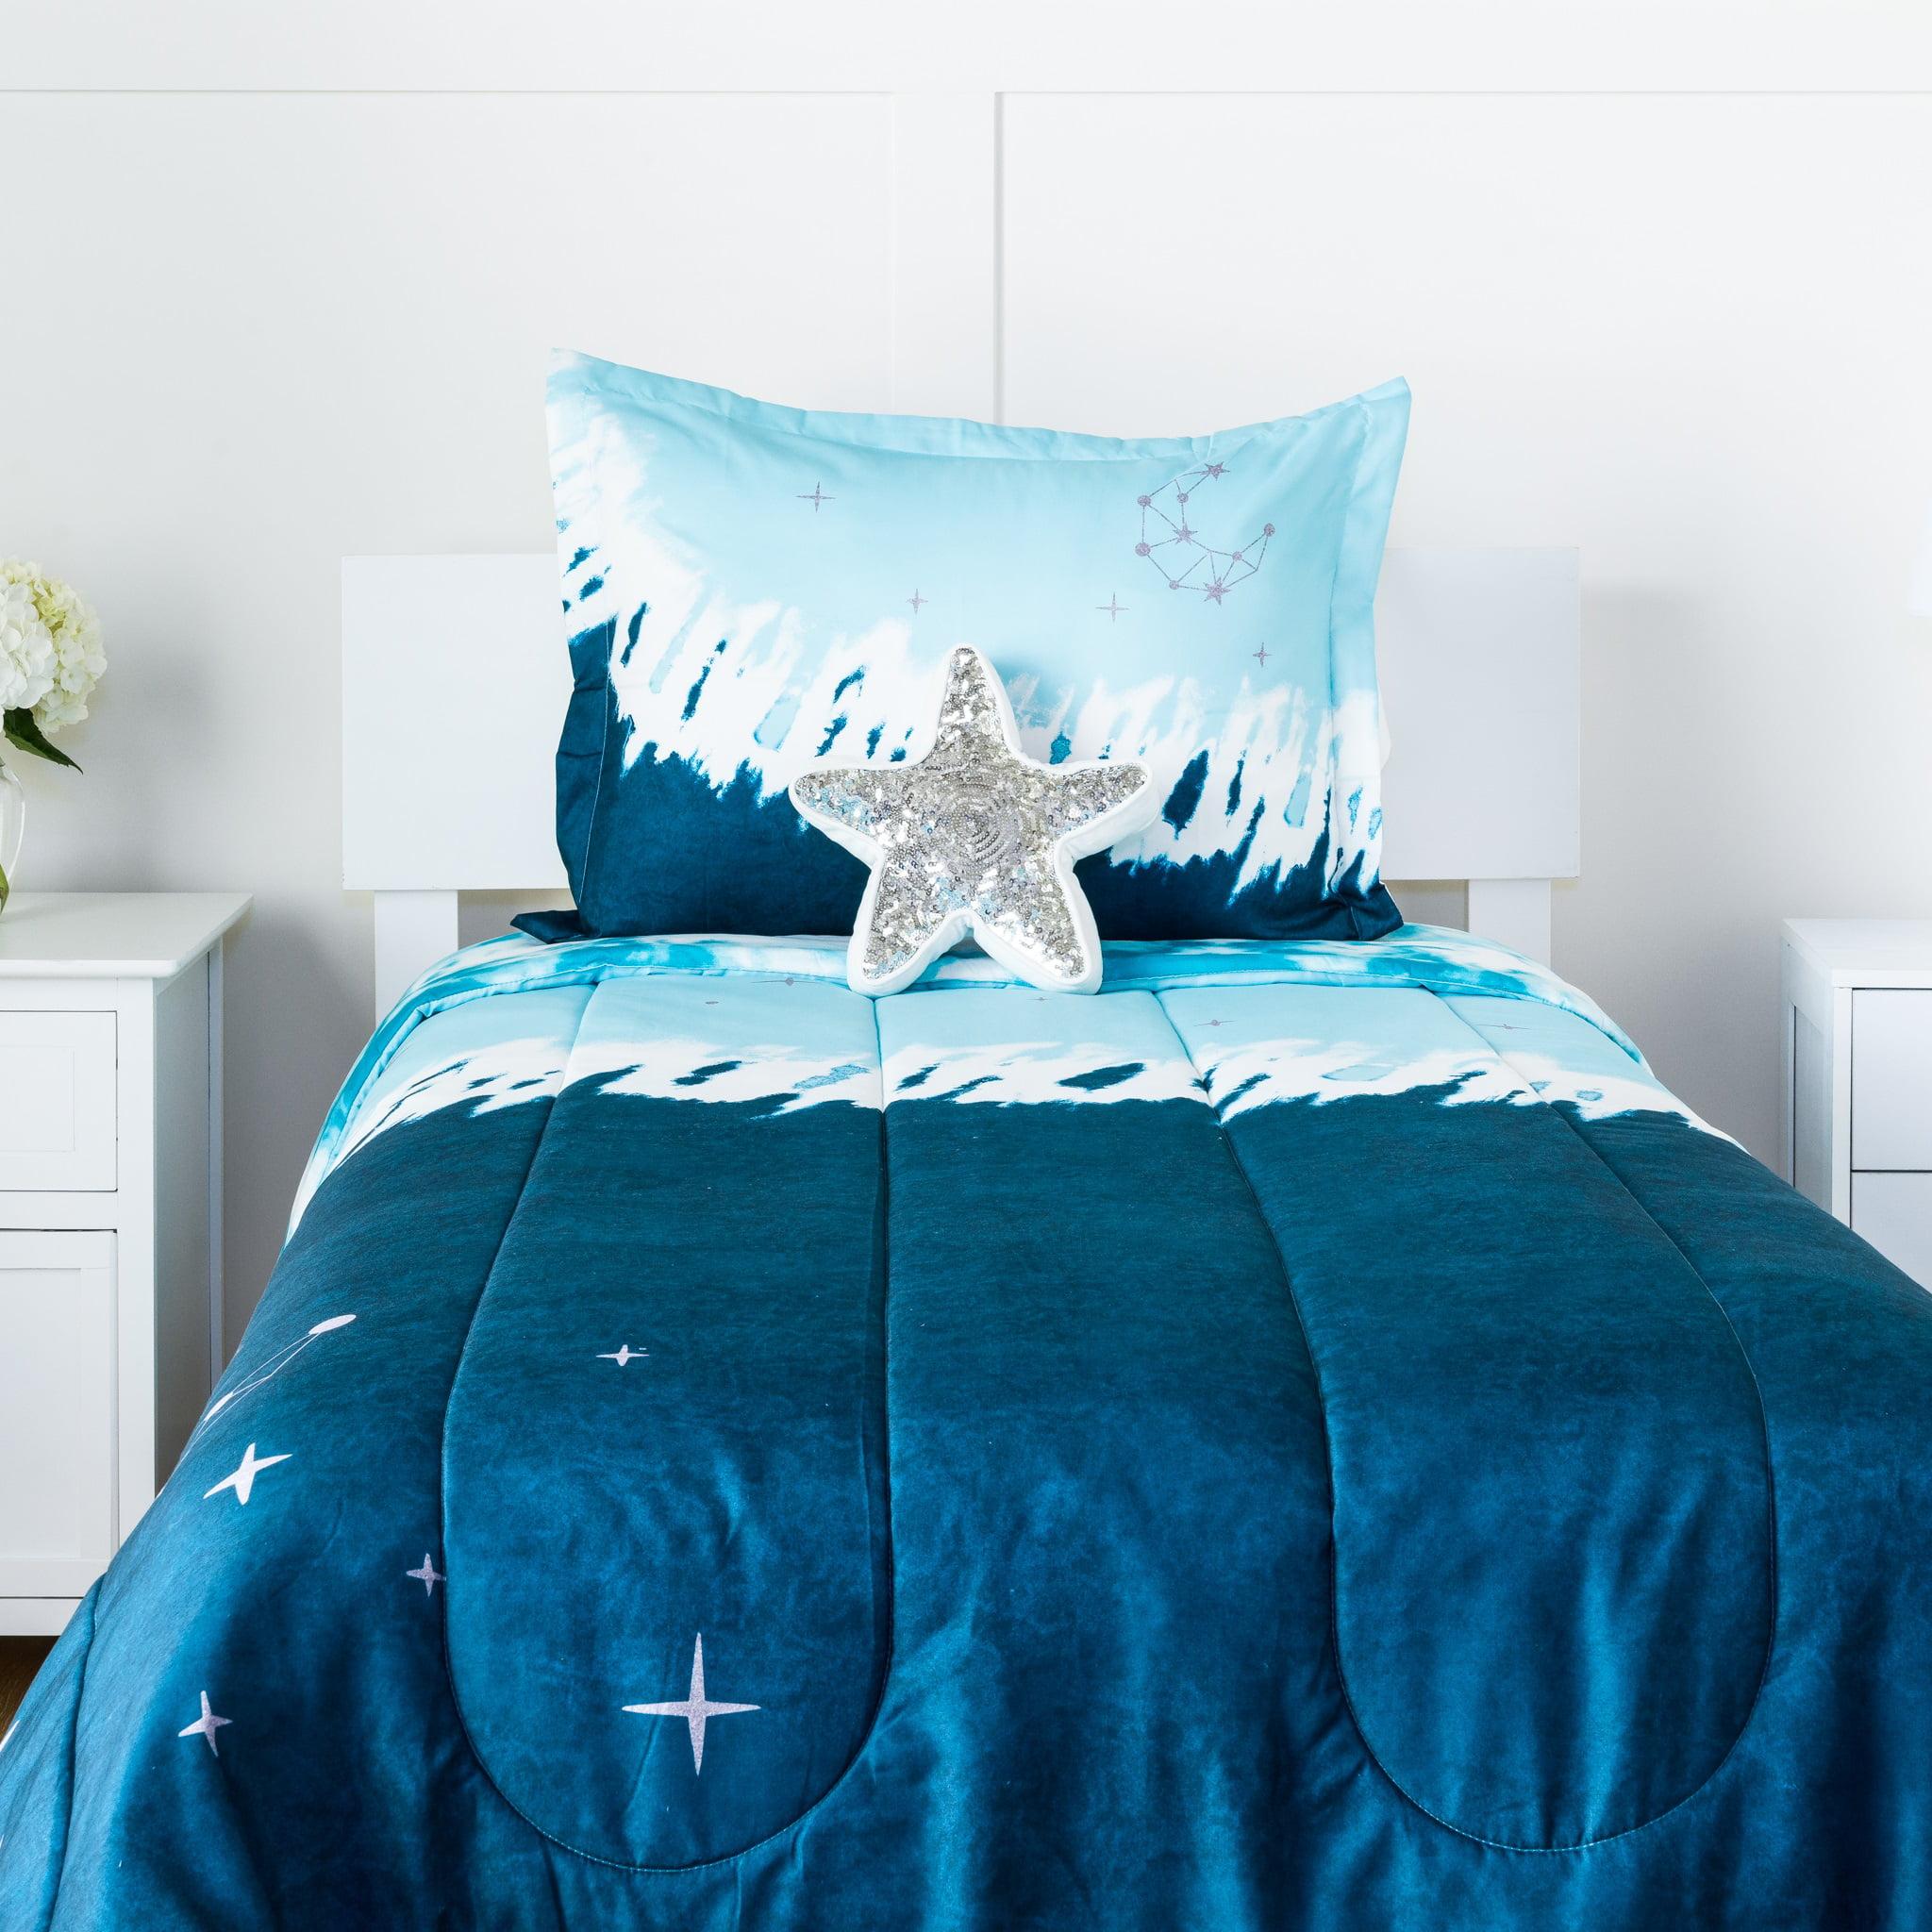 Justice Teen/Tween Tie-Dye Polyester Reversible Comforter Sets, Twin/Full, Blue, 3-Pieces